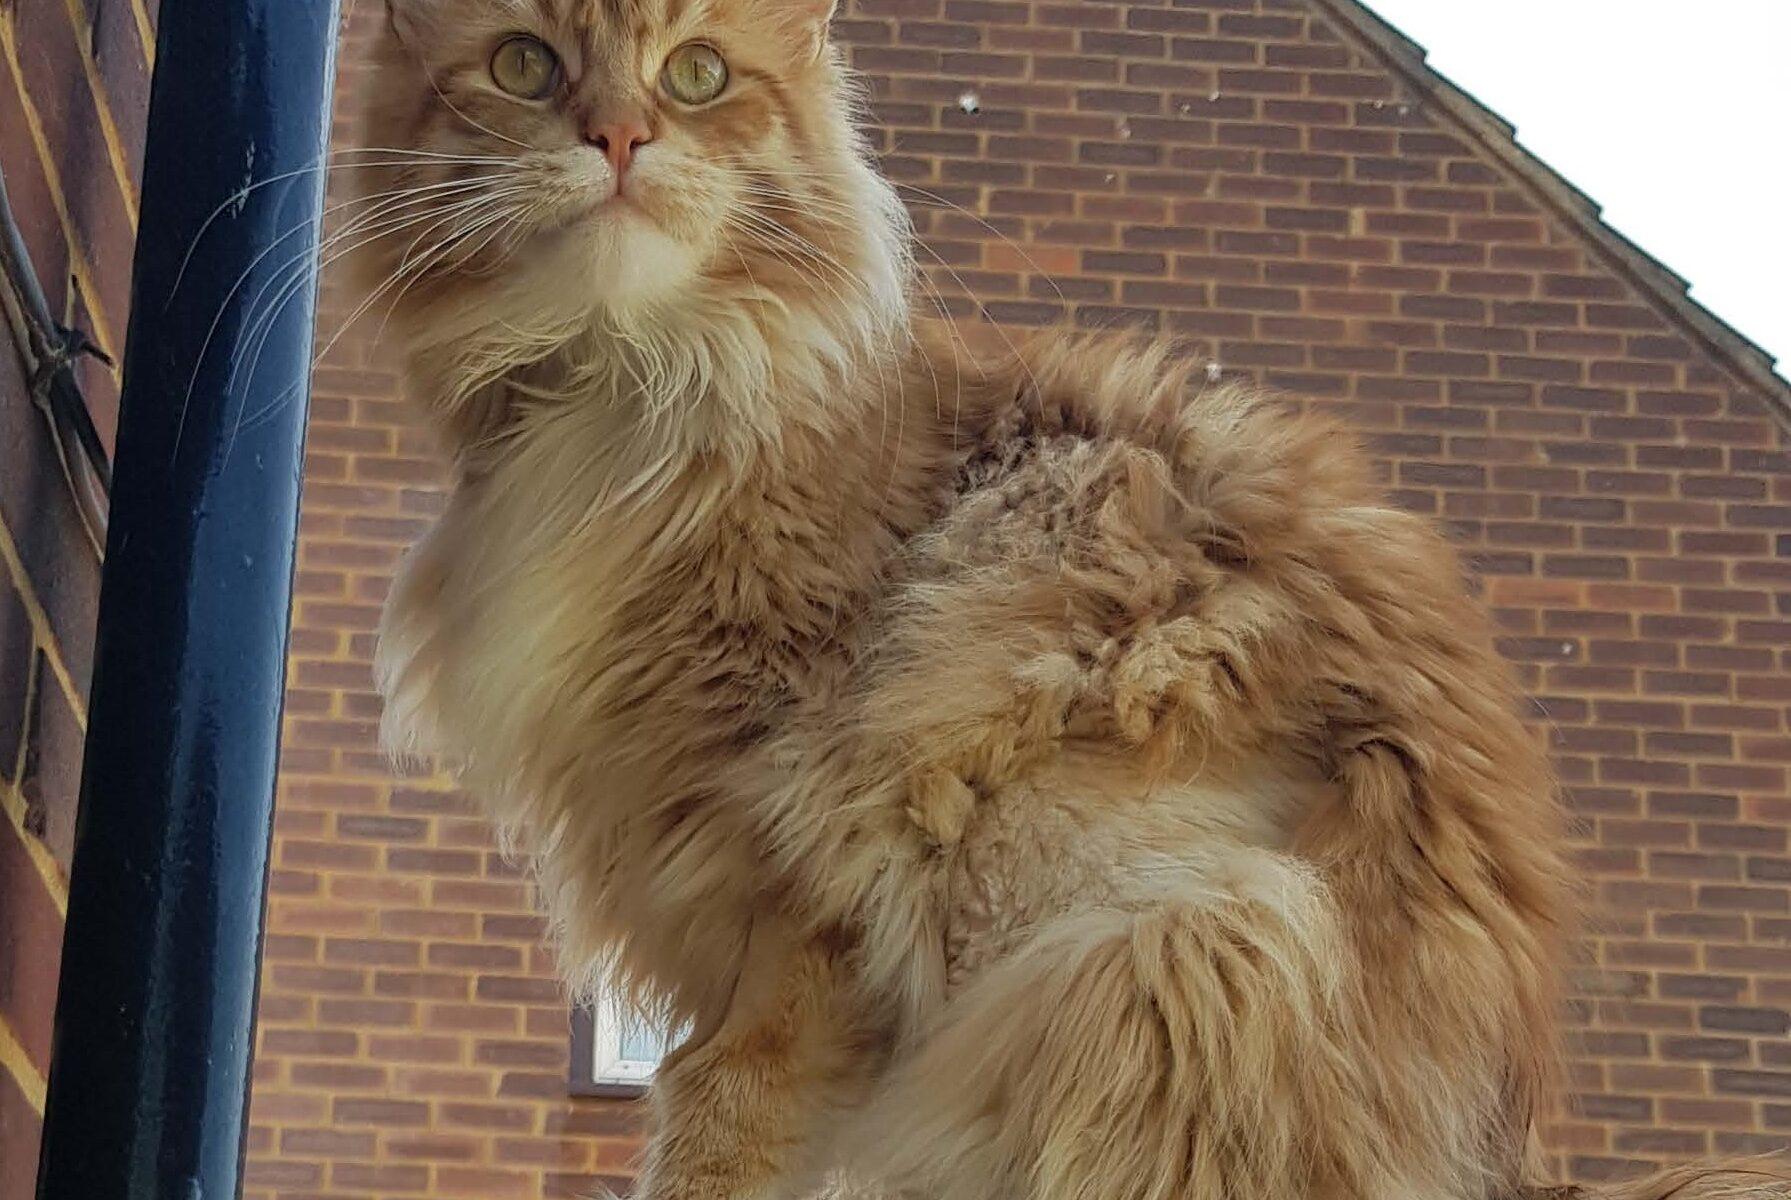 ginger cat sat on patio edge